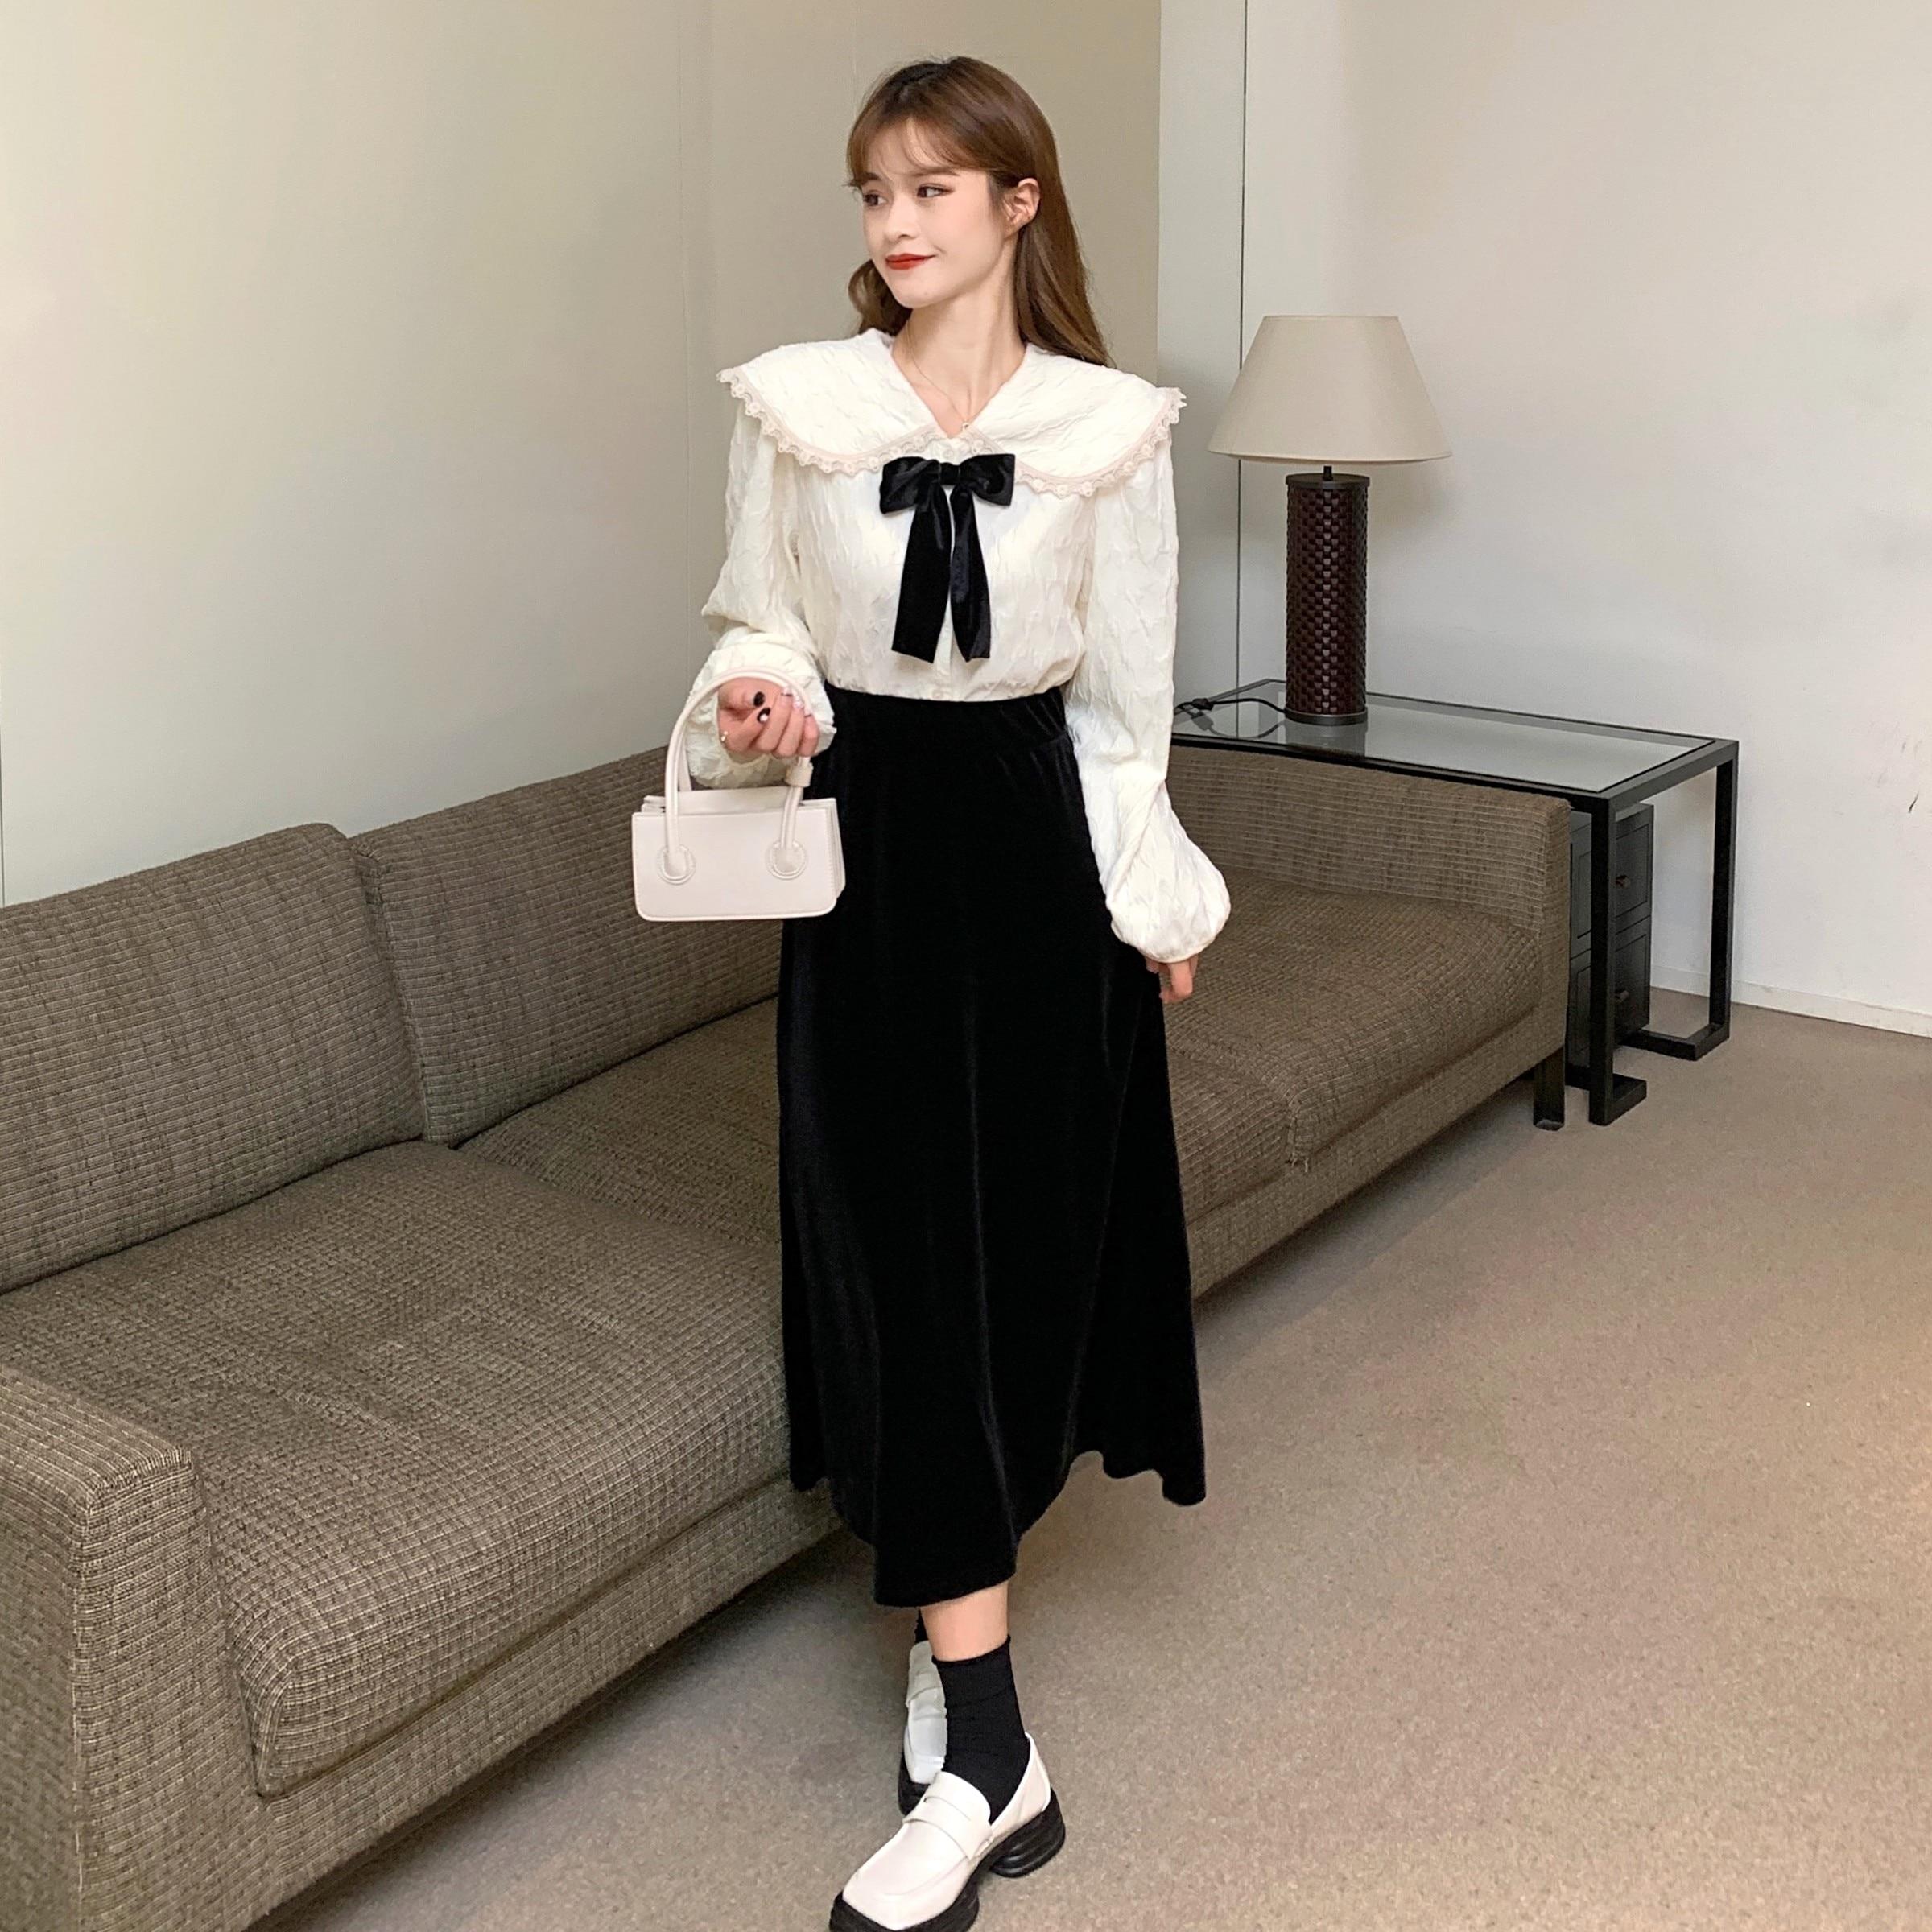 New 2021 Autumn Women France Two Piece Set Peter Pan Collar Bow Long Sleeve Shirt+Black Velvet Elastic waist Skirt Suit Female